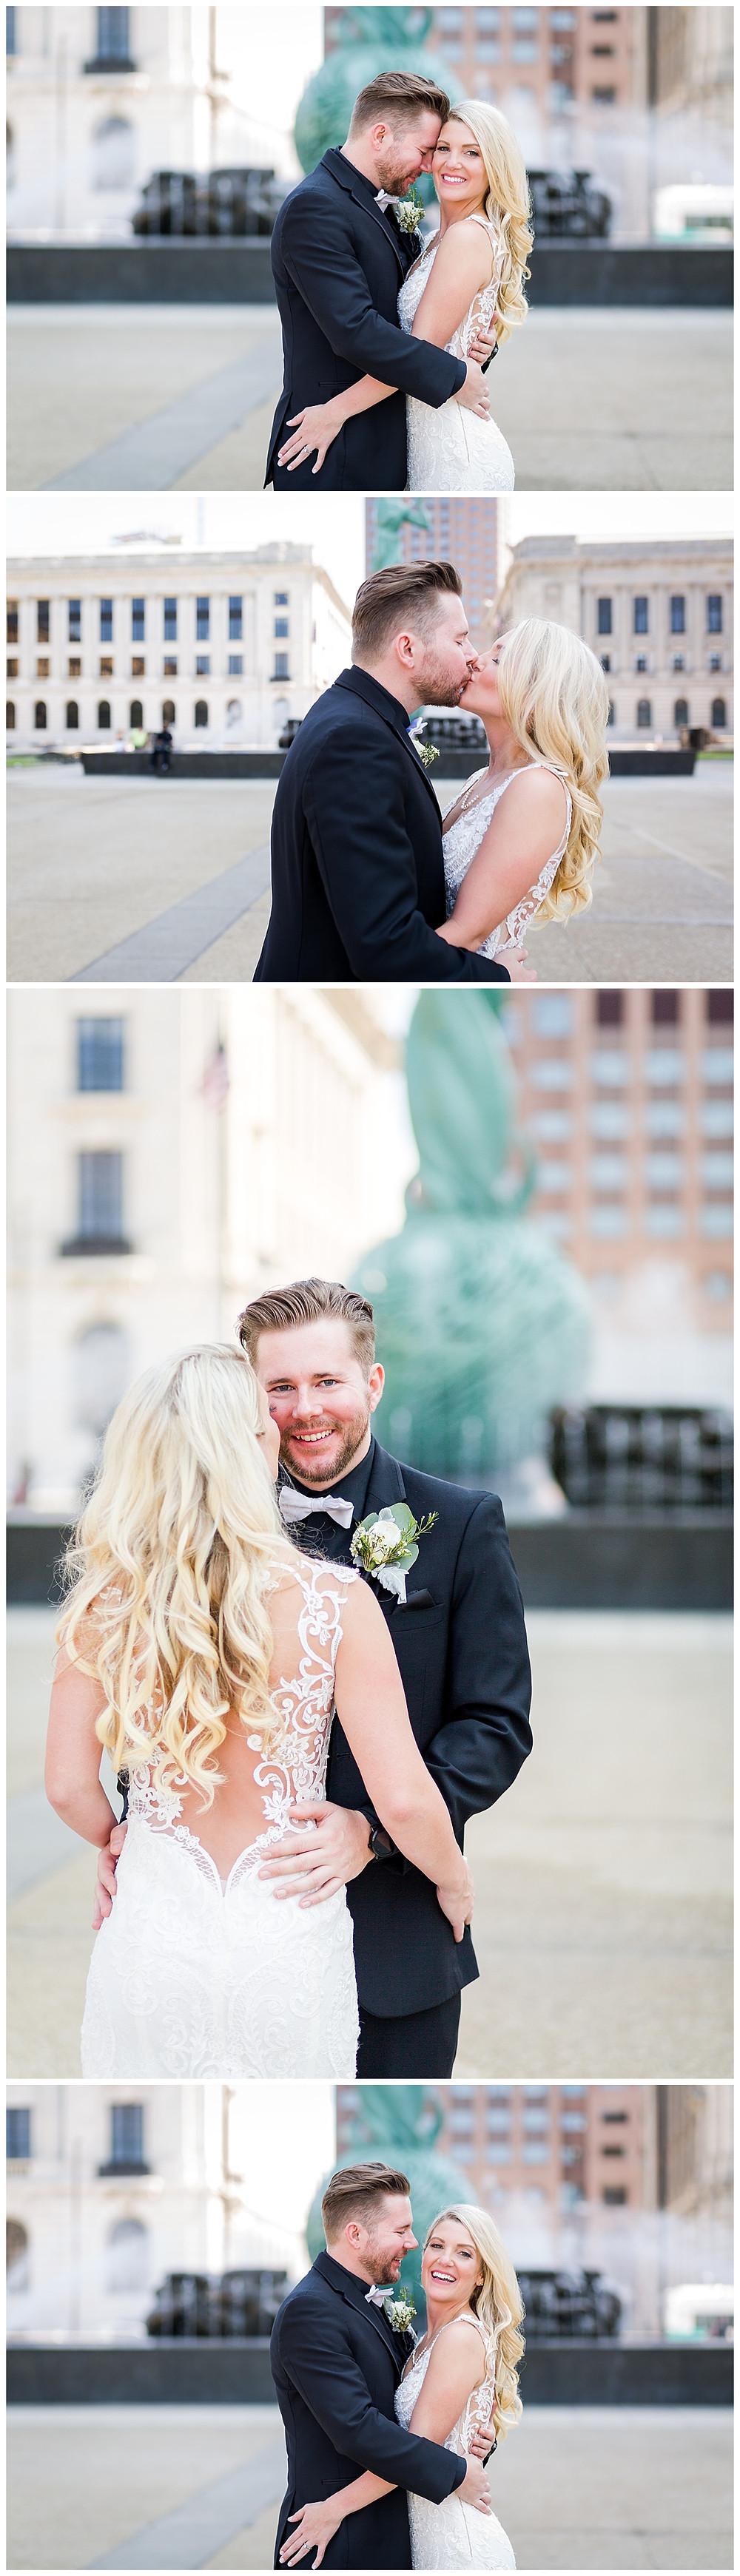 bride and groom photos cleveland ohio